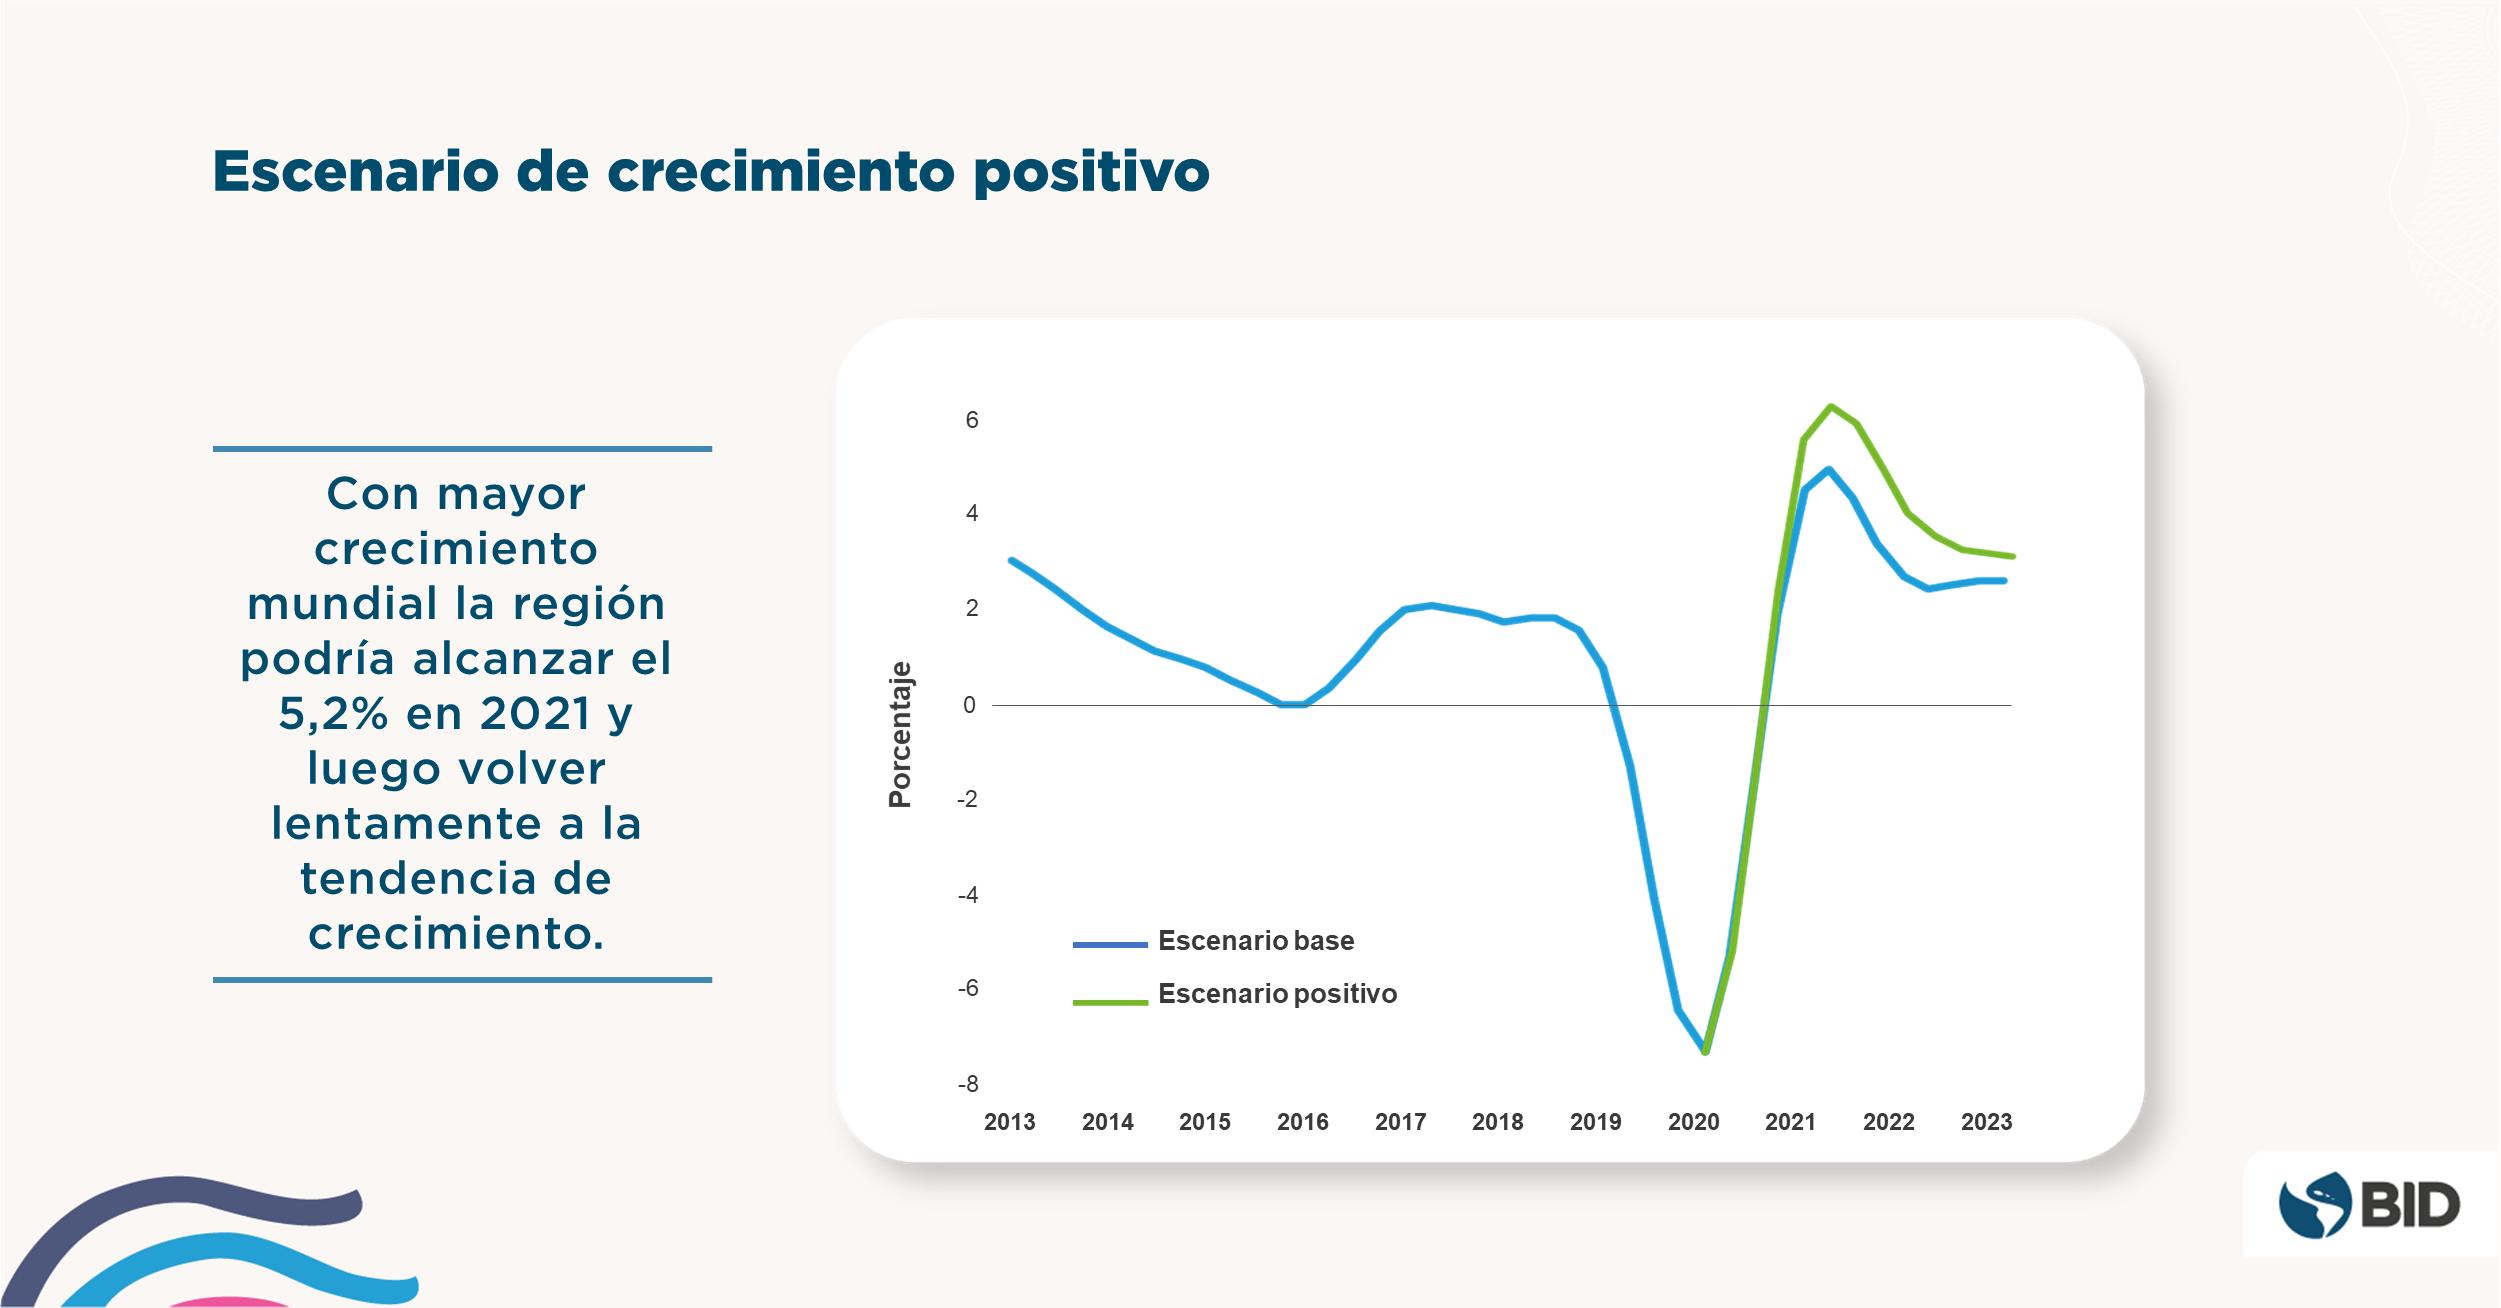 Informe Macroeconomico America Latina Caribe 2021 - Escenario positivo